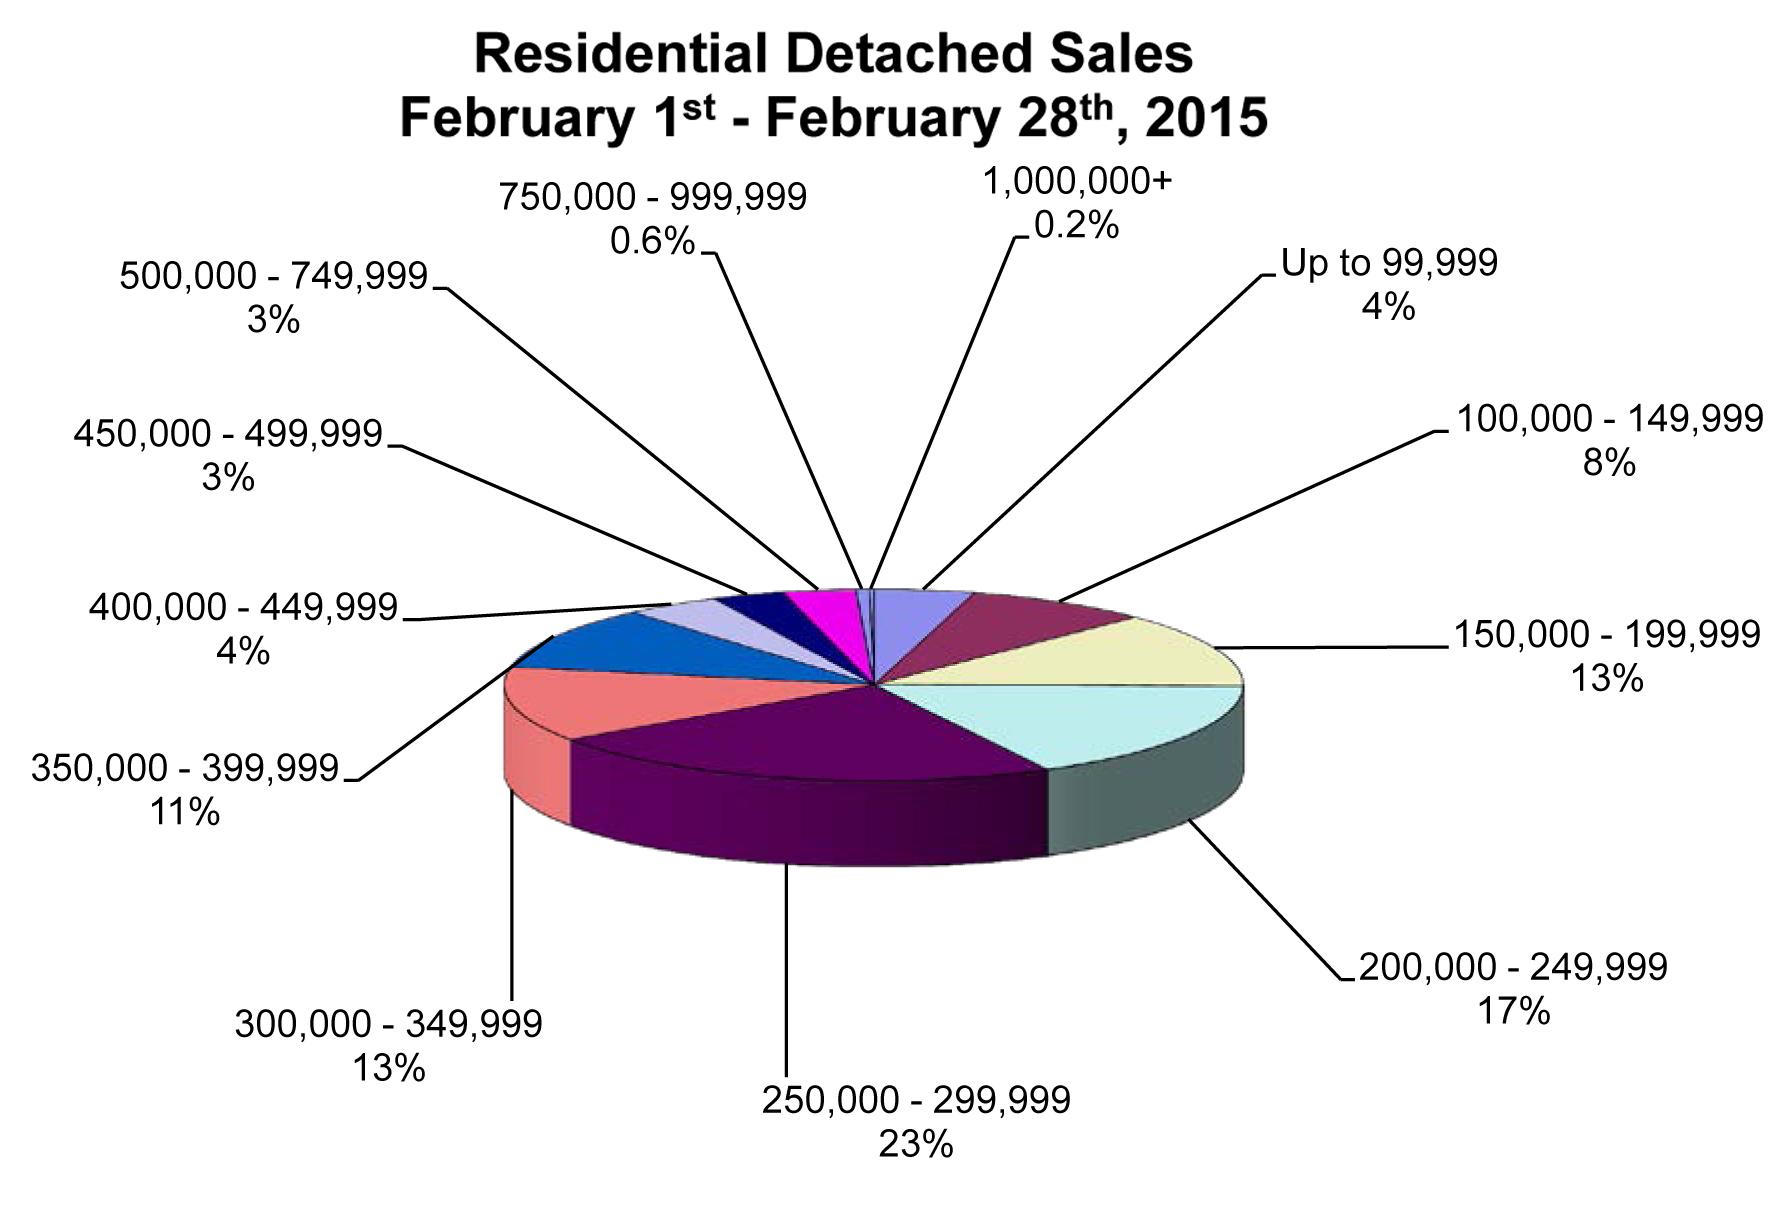 2015-03-05 RD Sales Pie Chart.jpg